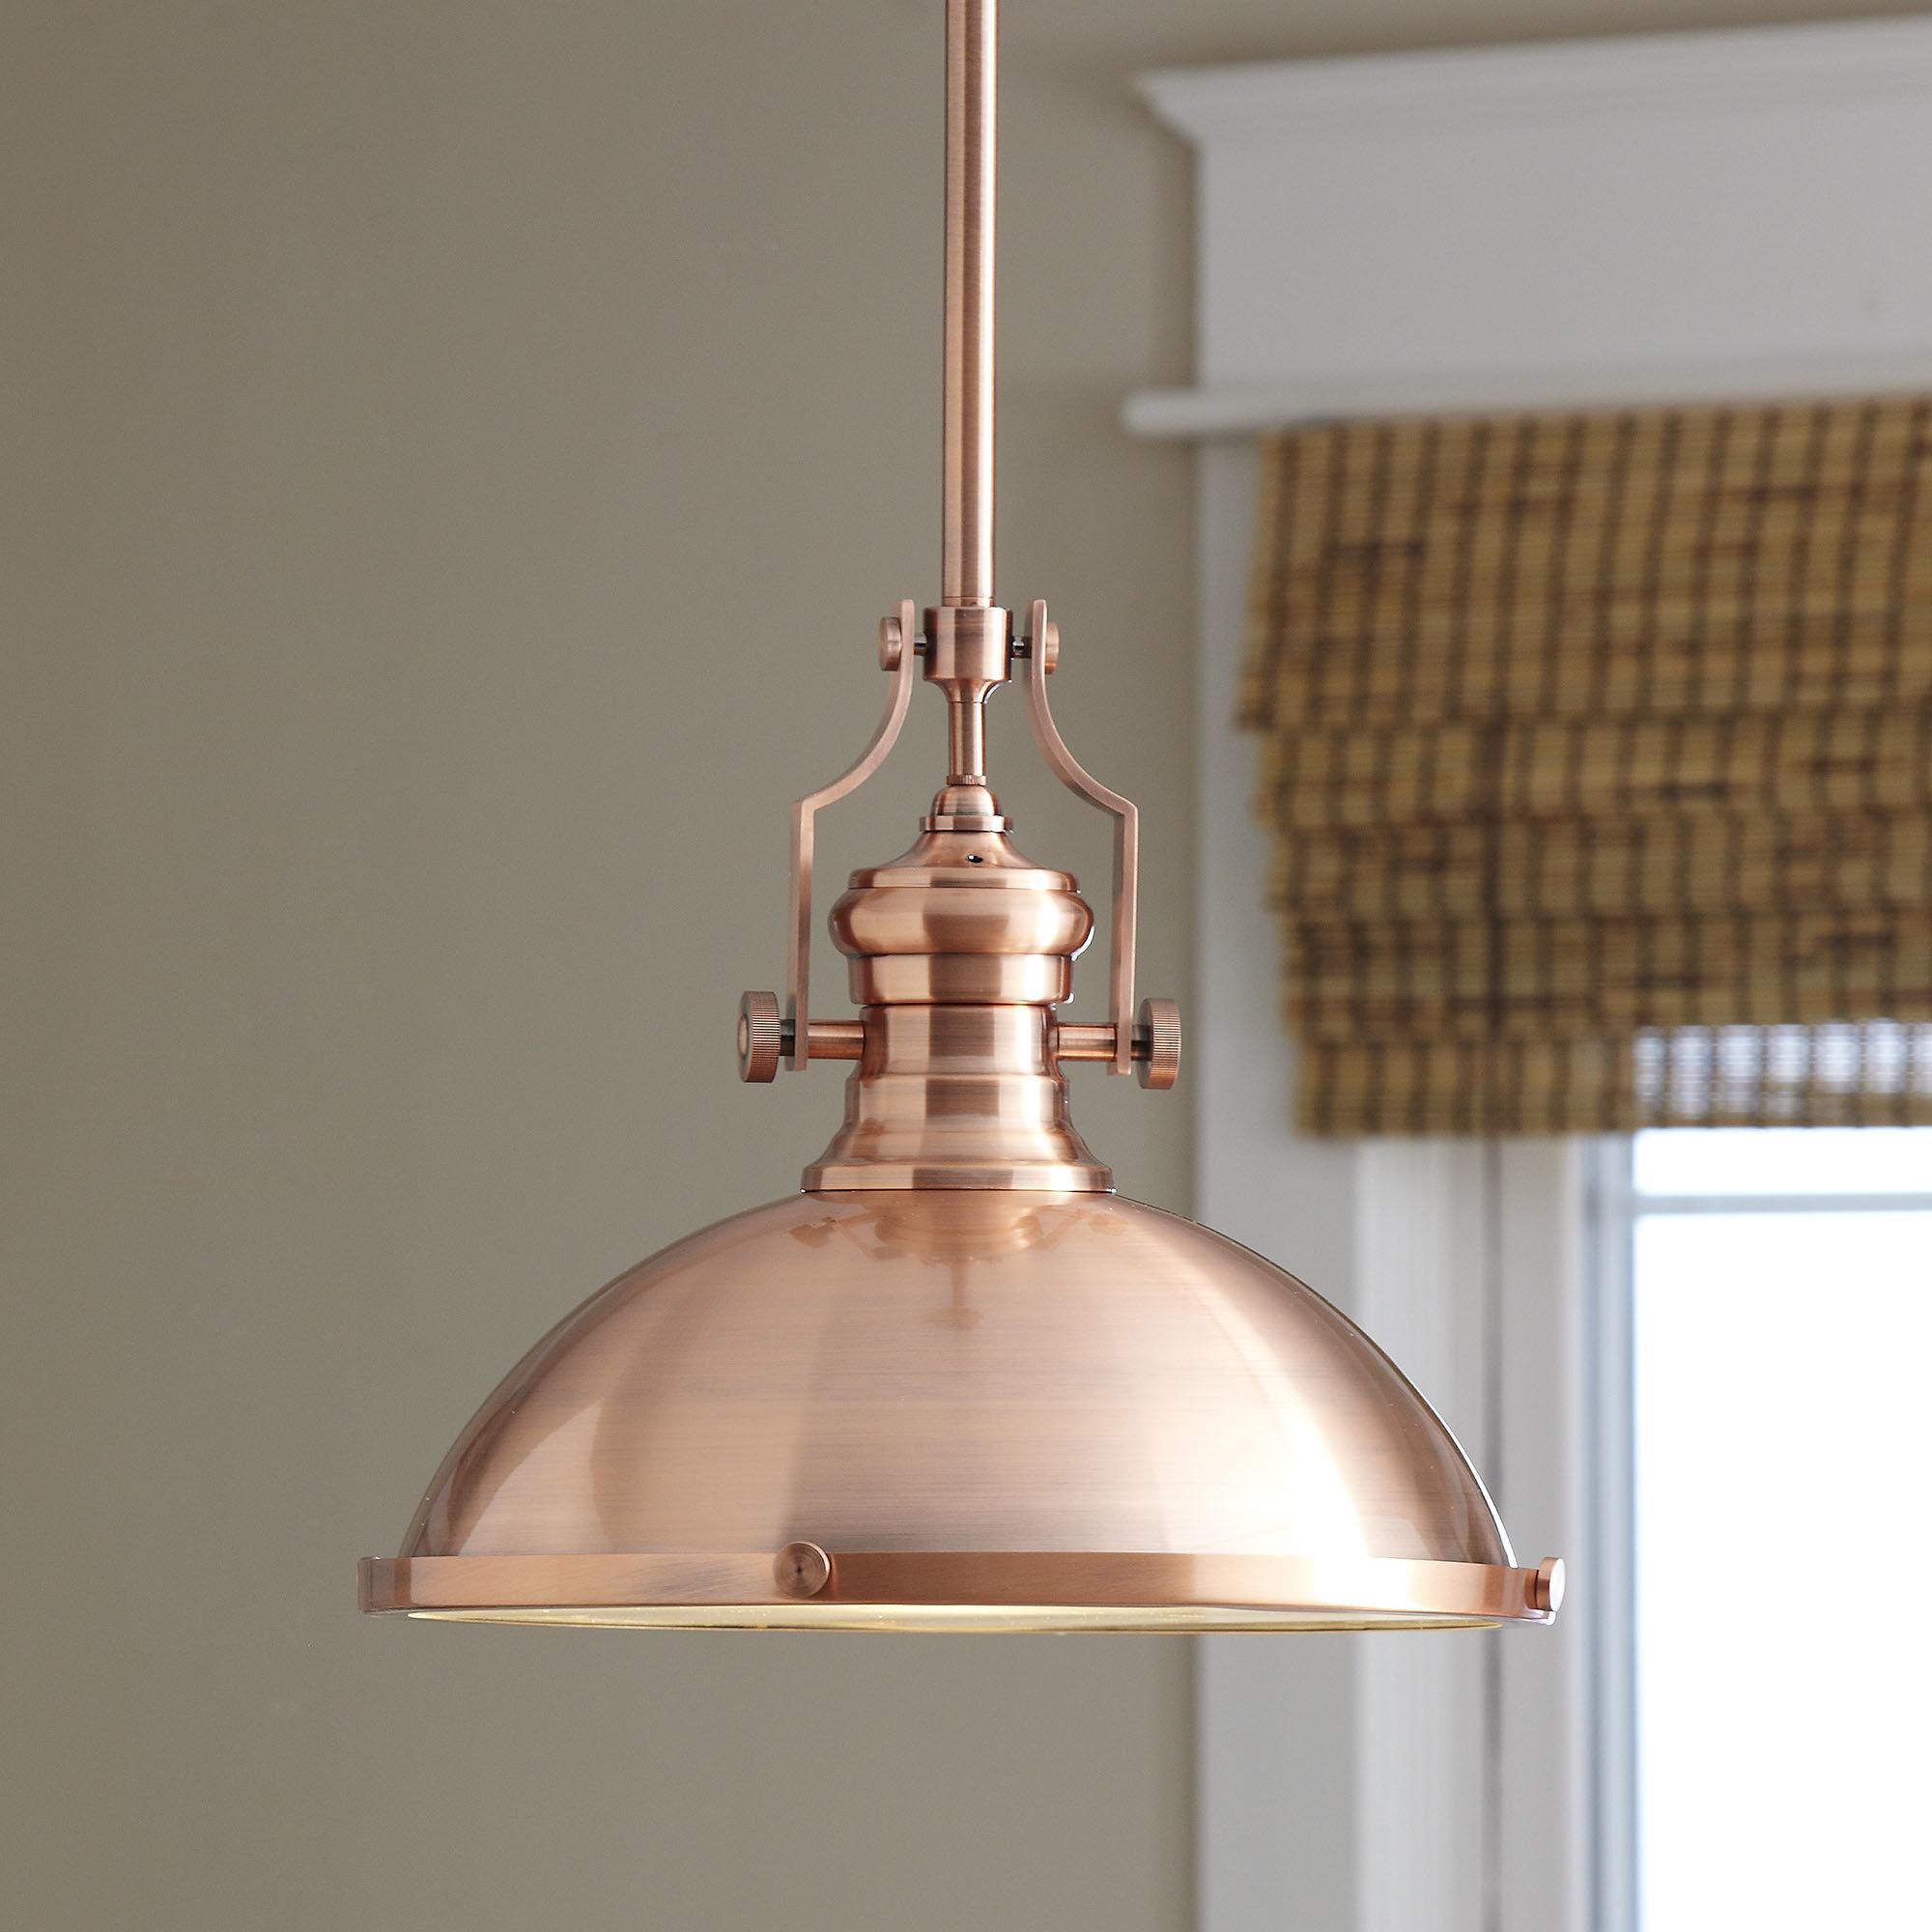 1 Light Single Dome Pendant With Regard To Current Freeda 1 Light Single Dome Pendants (Gallery 18 of 25)